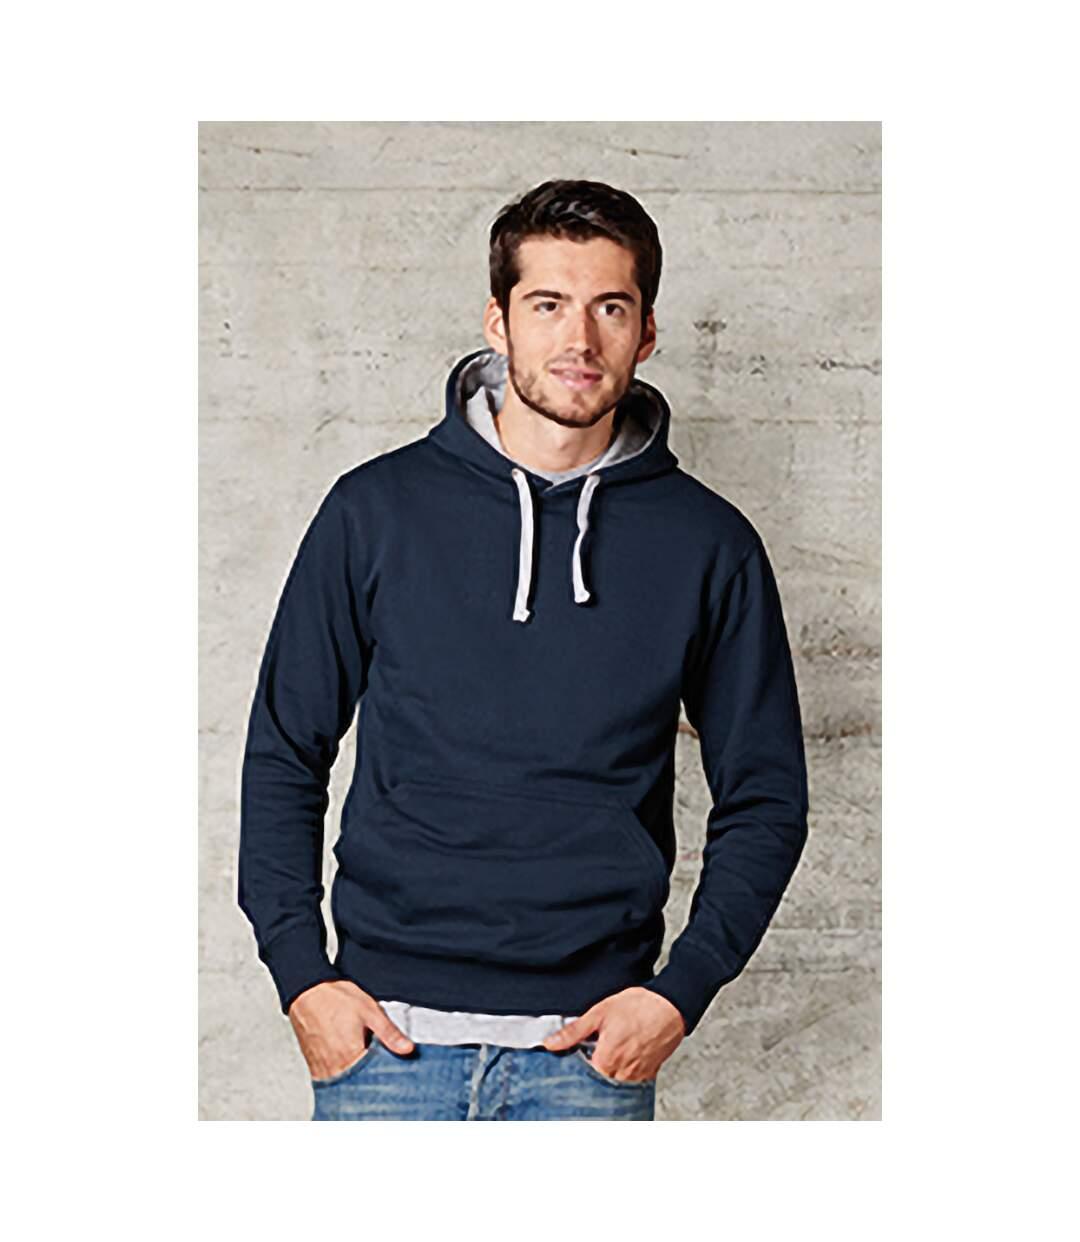 FDM Unisex Contrast Hooded Sweatshirt / Hoodie (300 GSM) (Navy/Heather Grey) - UTBC2025